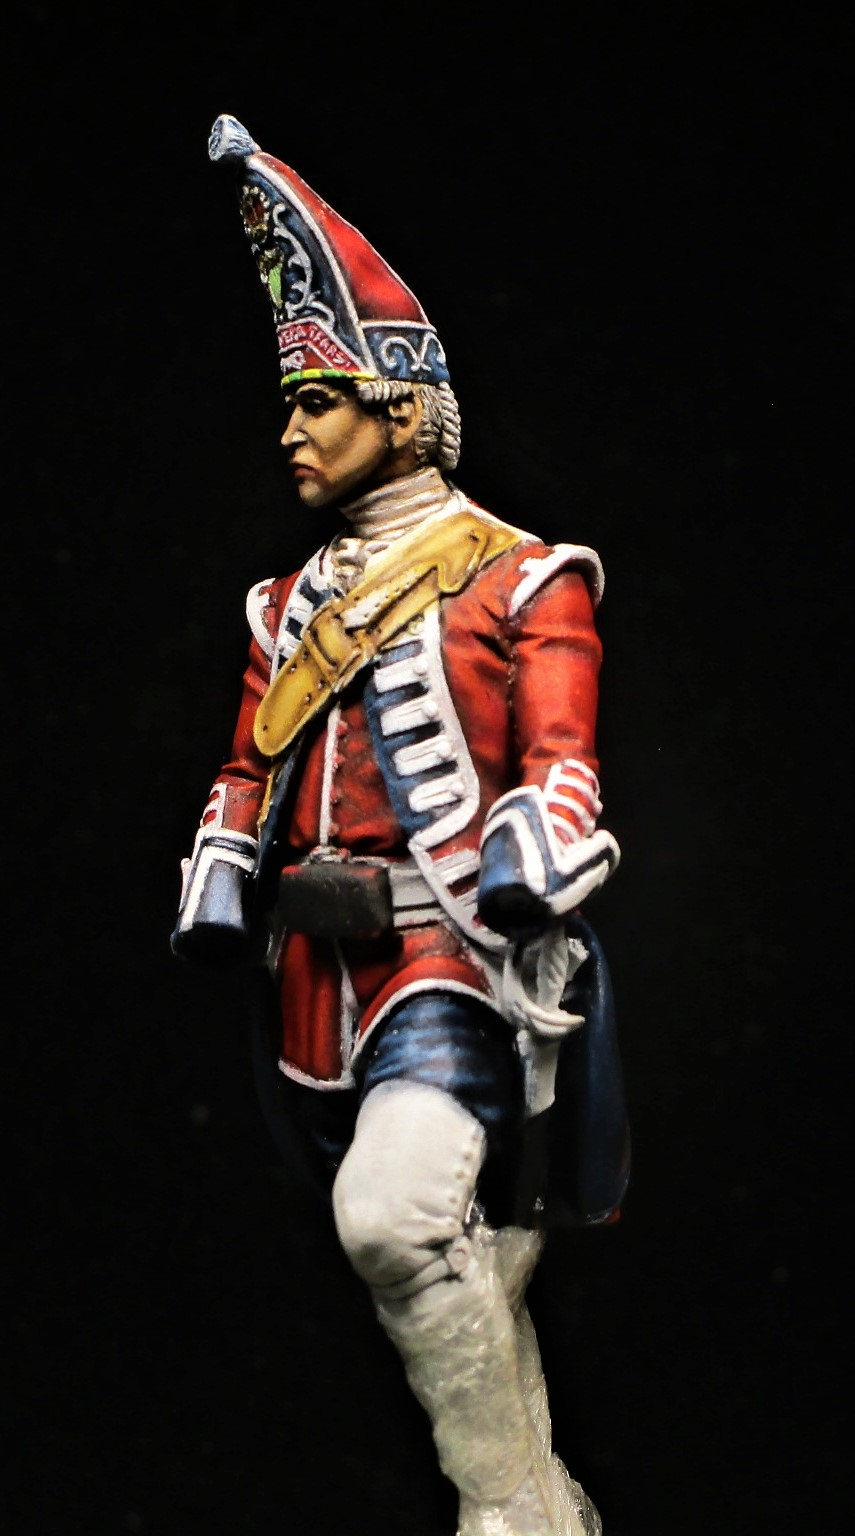 grenadier anglais du 18th Foot en 1751 Img_1111